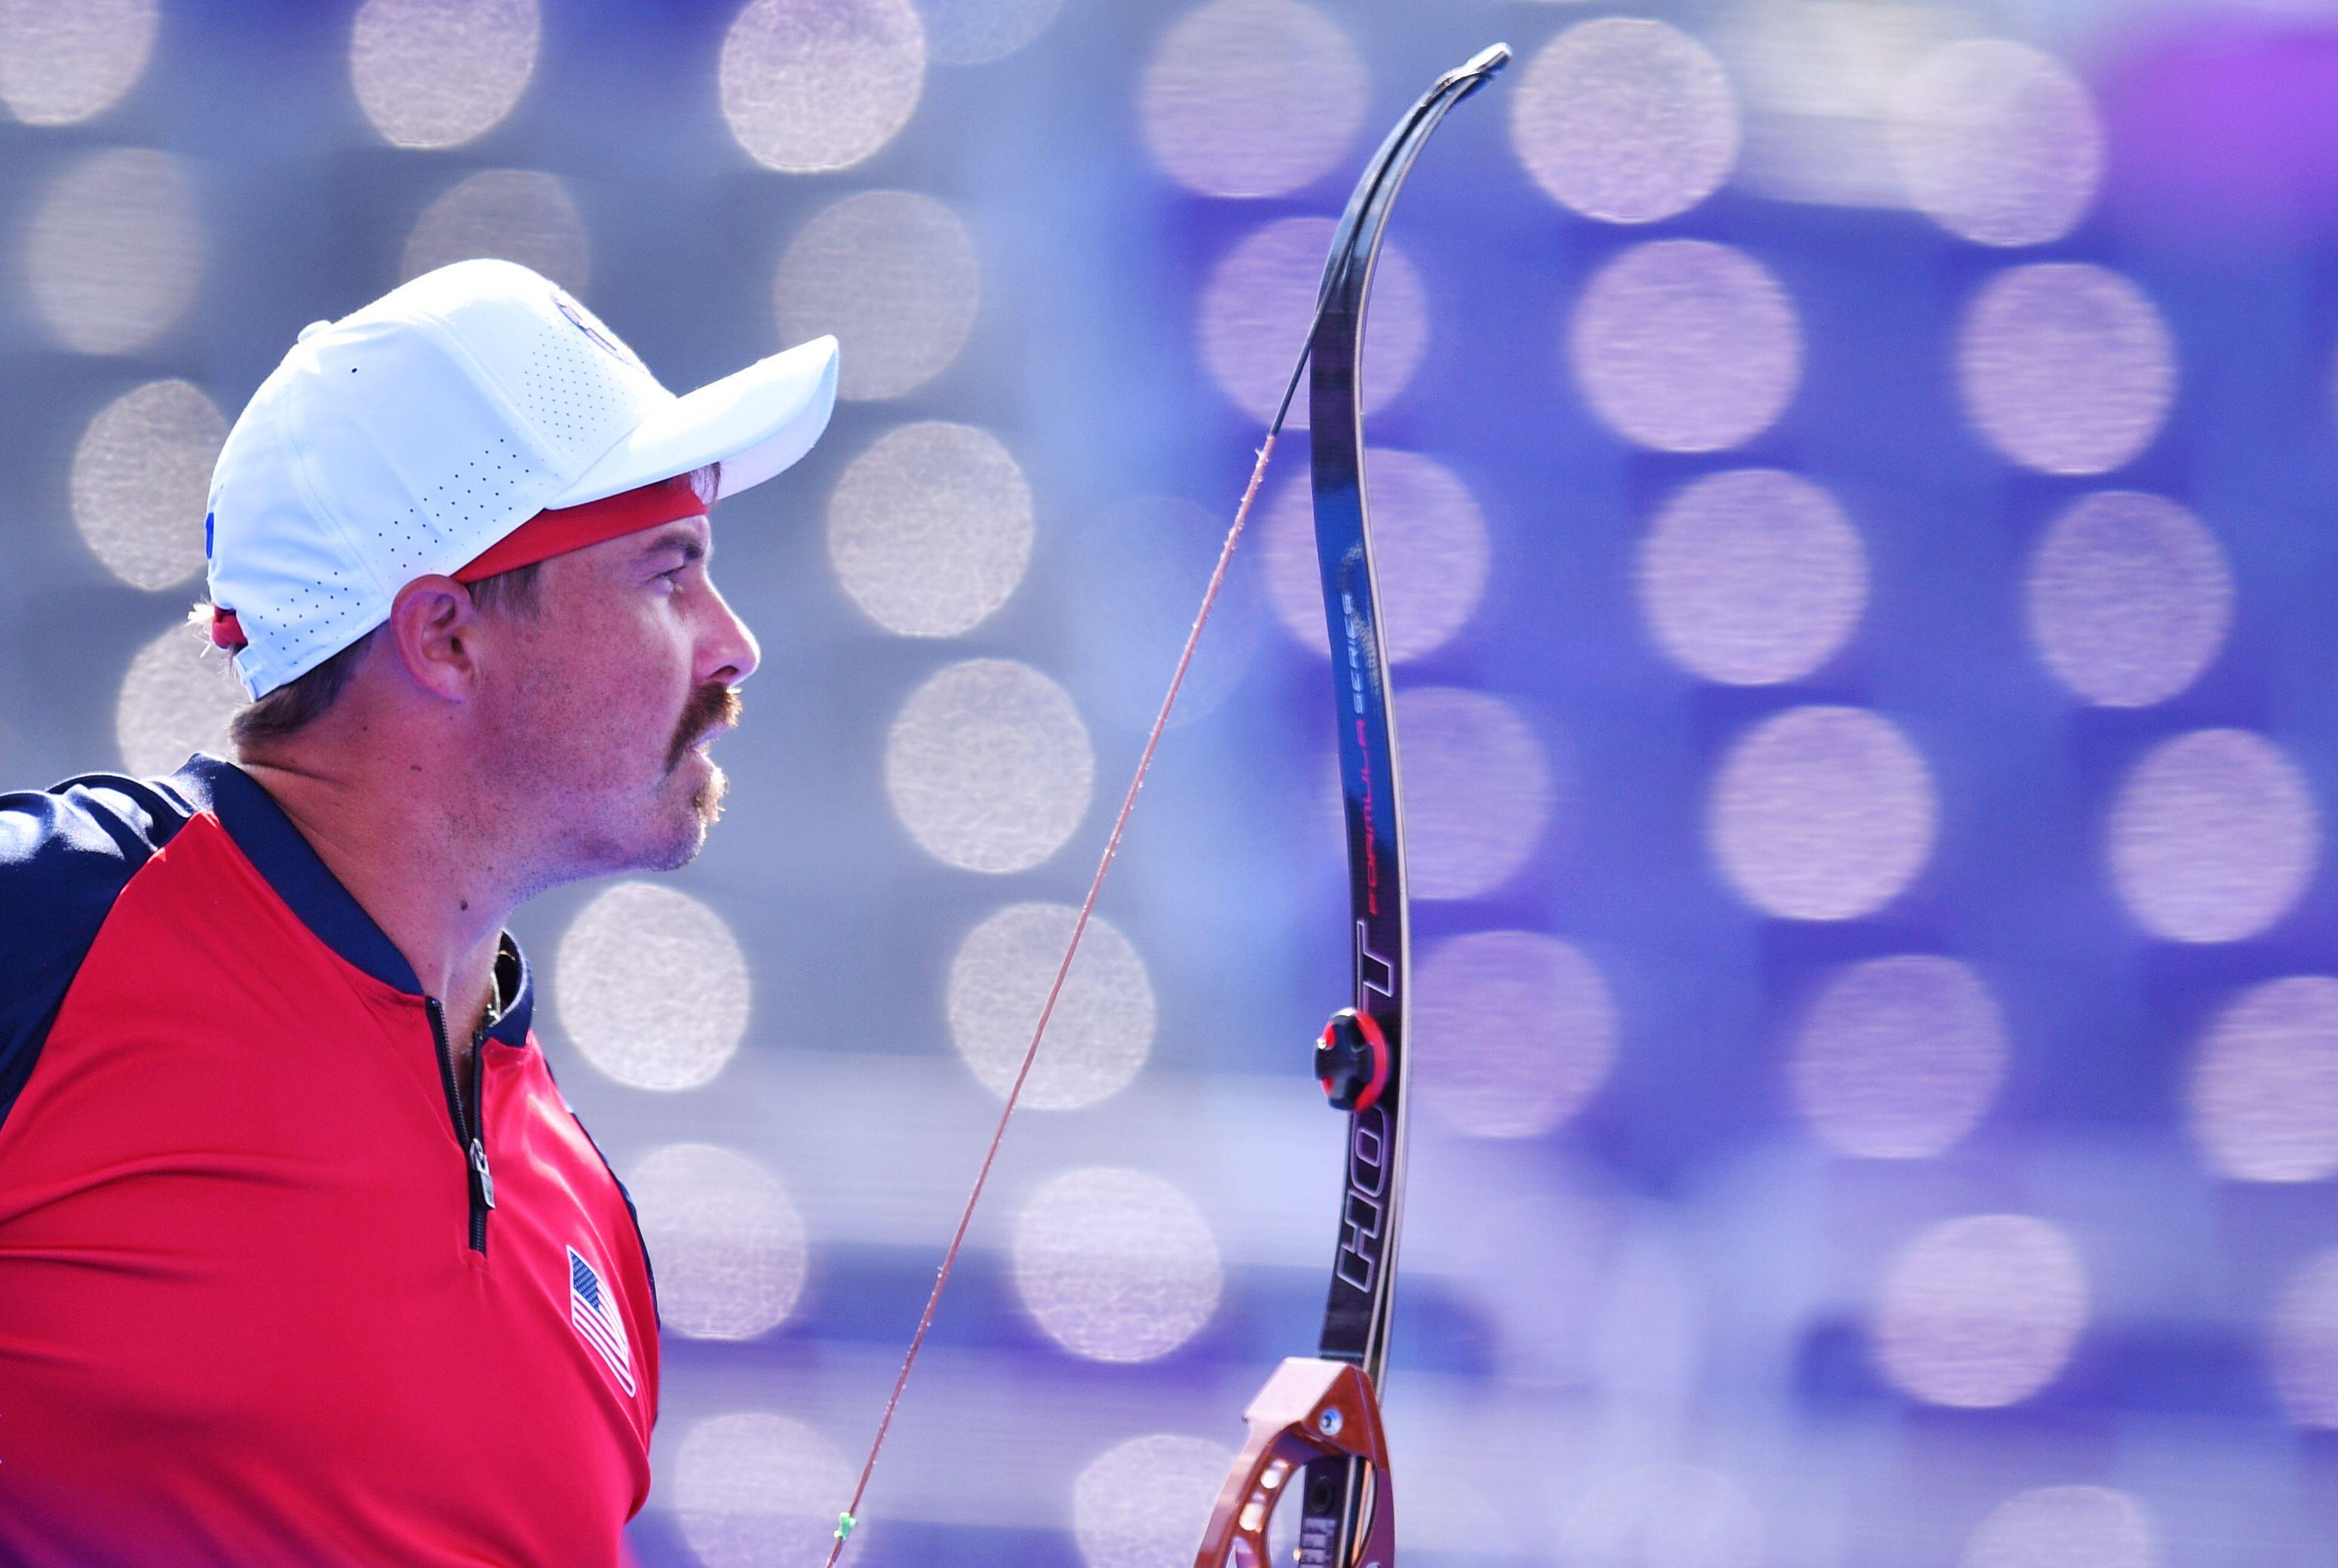 Tokyo 2020 Olympics - Archery - Men's Individual - Quarterfinals - Yumenoshima Archery Field, Tokyo, Japan - July 31, 2021.  Brady Ellison of the United States during competition REUTERS/Clodagh Kilcoyne